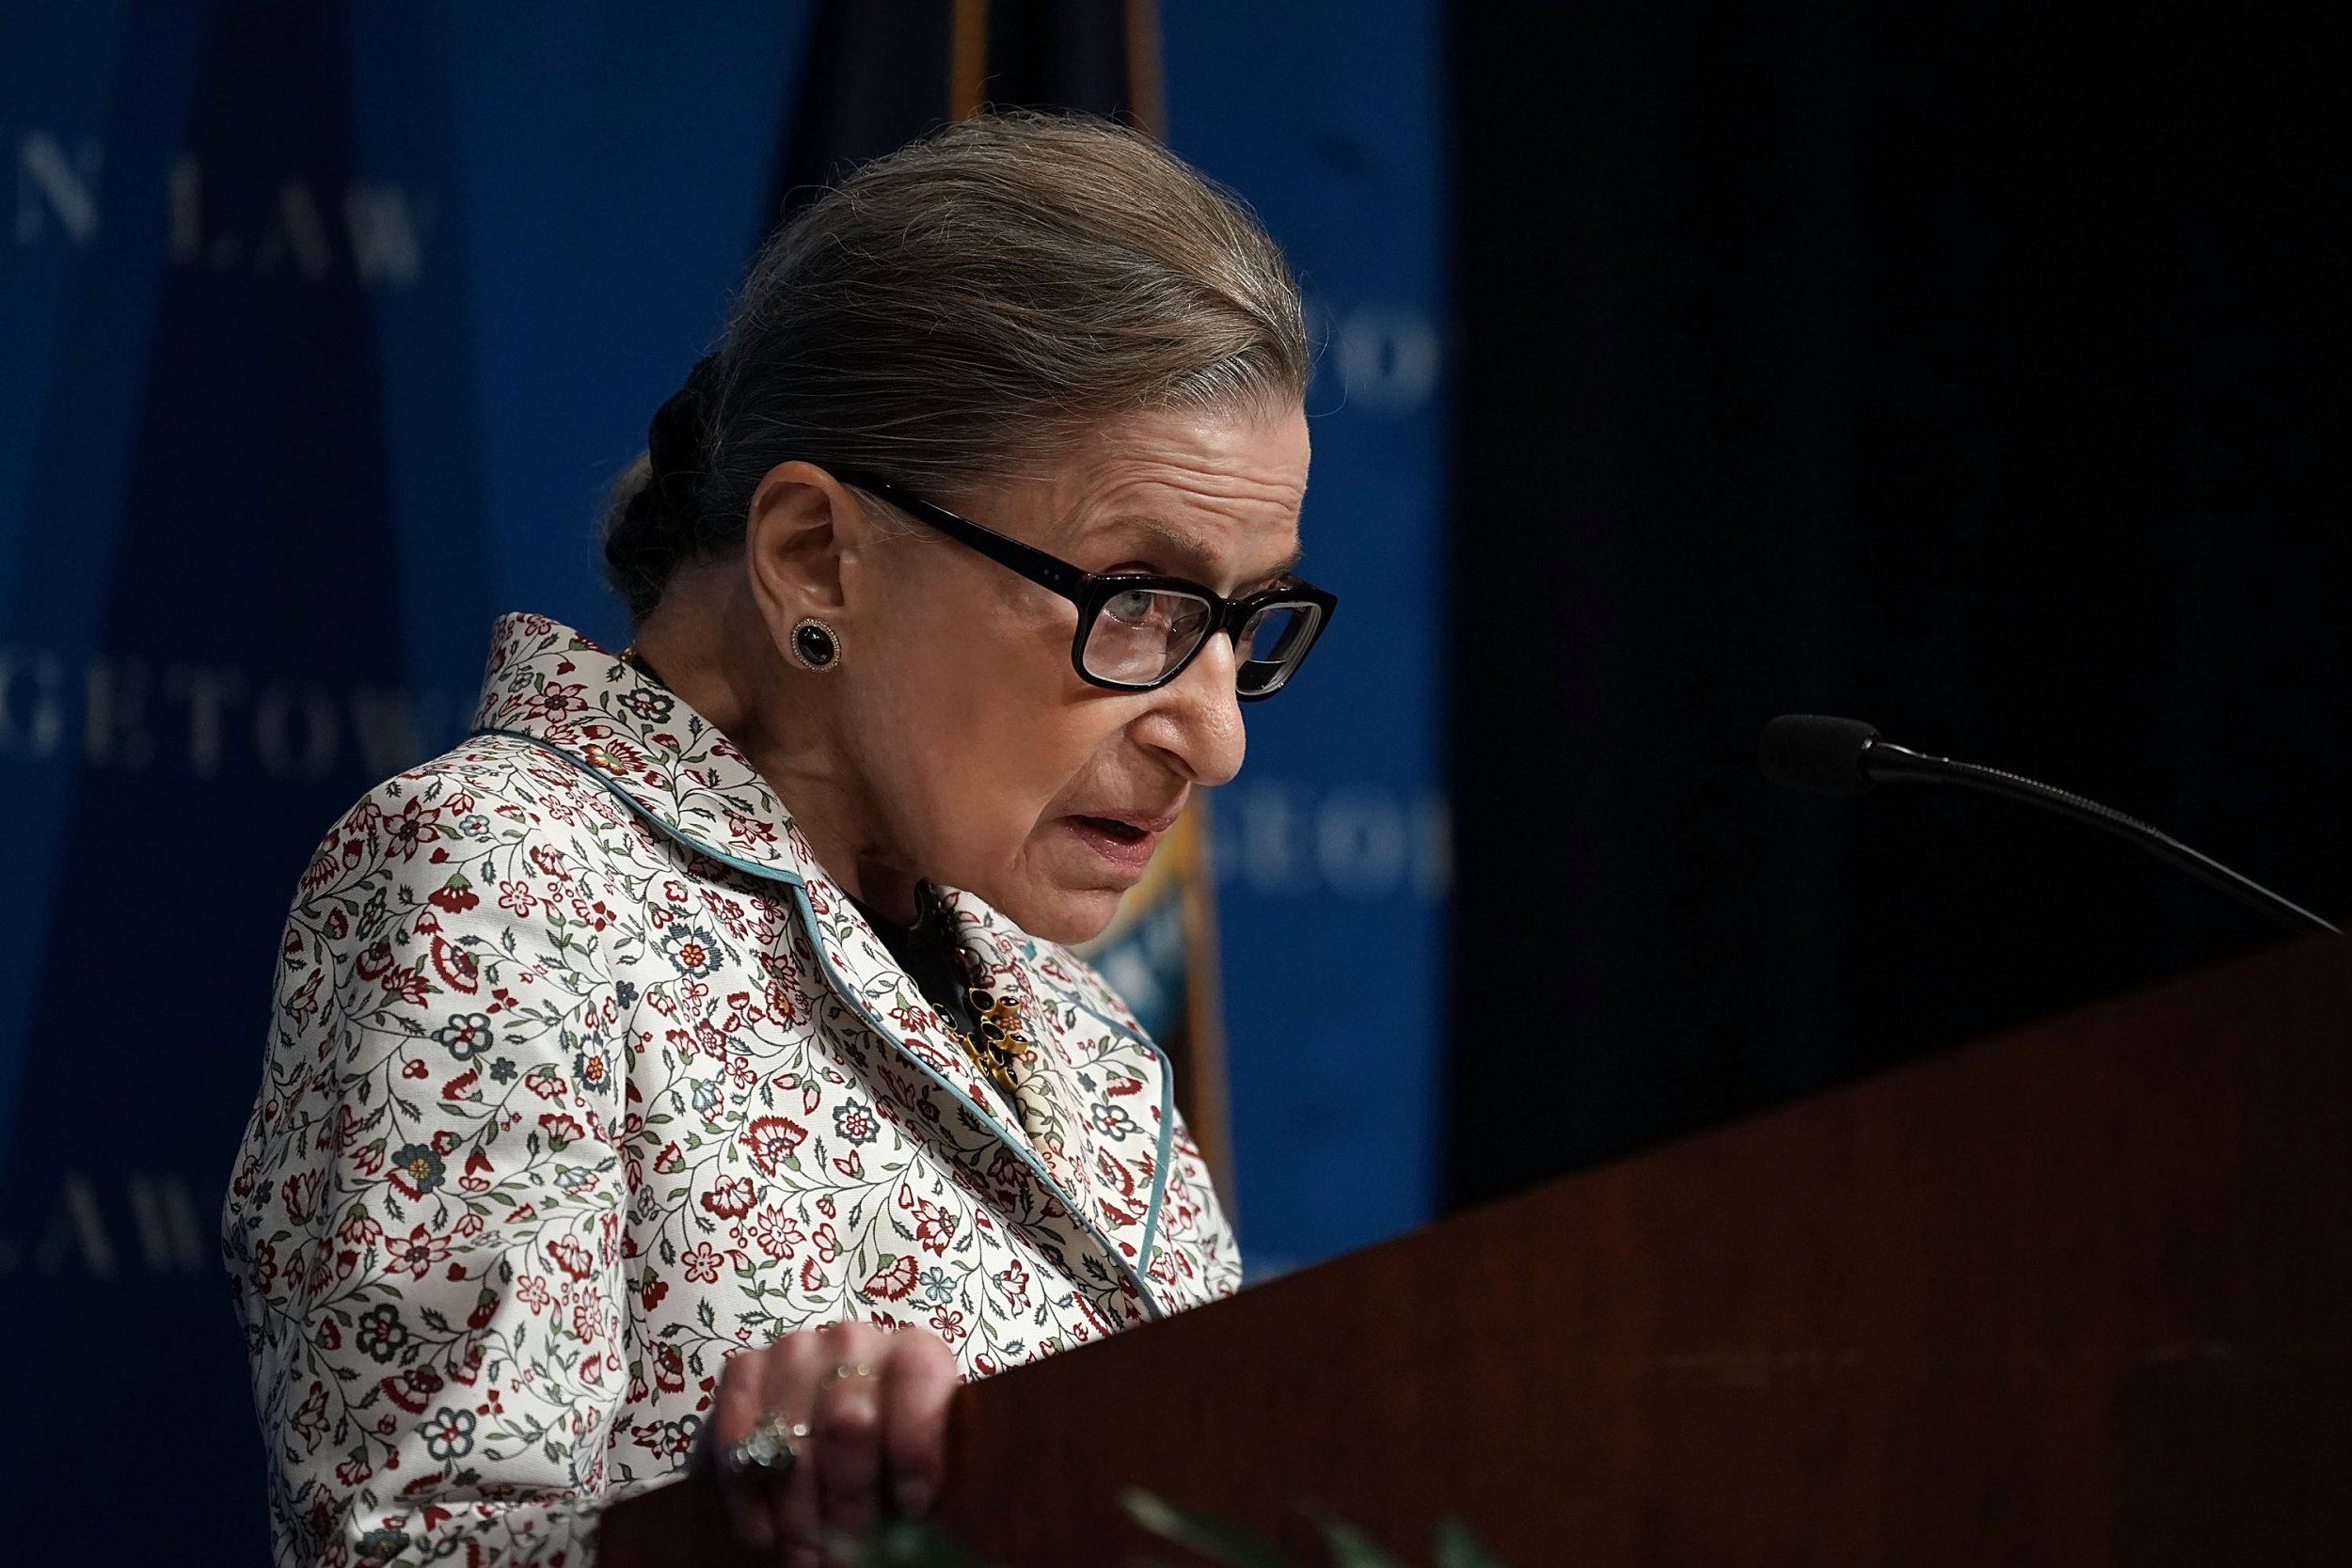 Ruth Bader Ginsburg Makes First Public